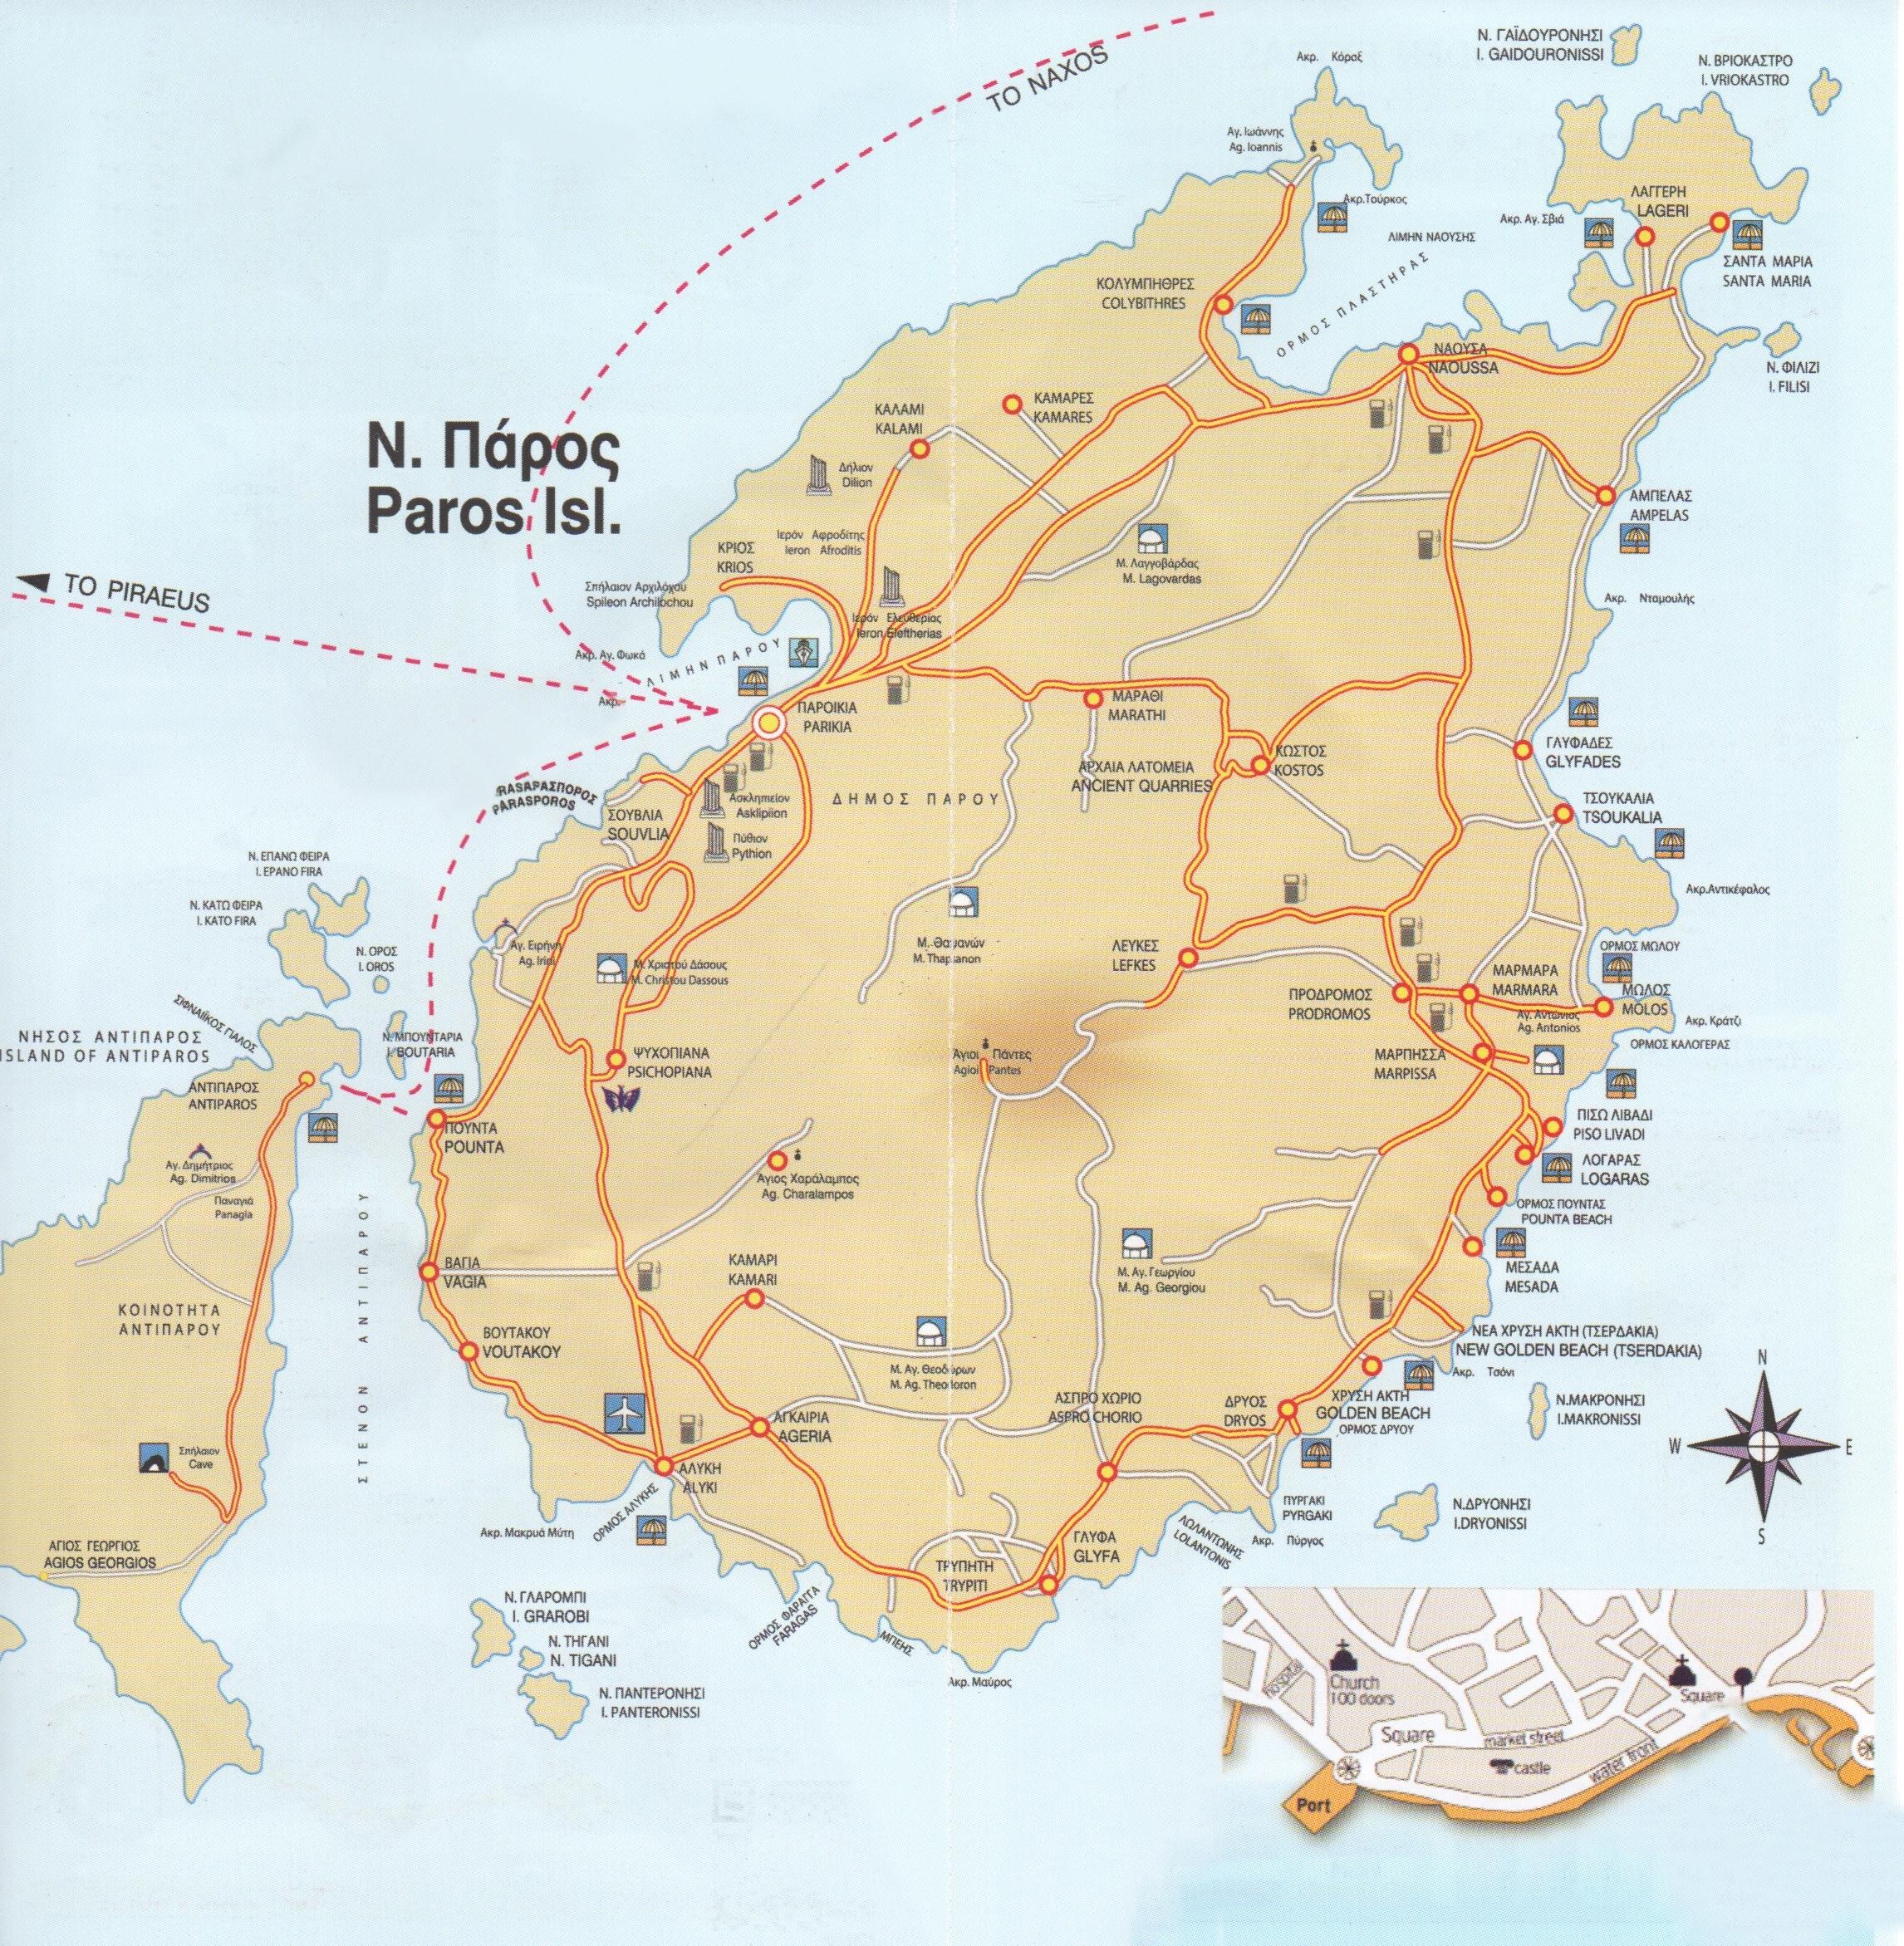 Mapa de Paros